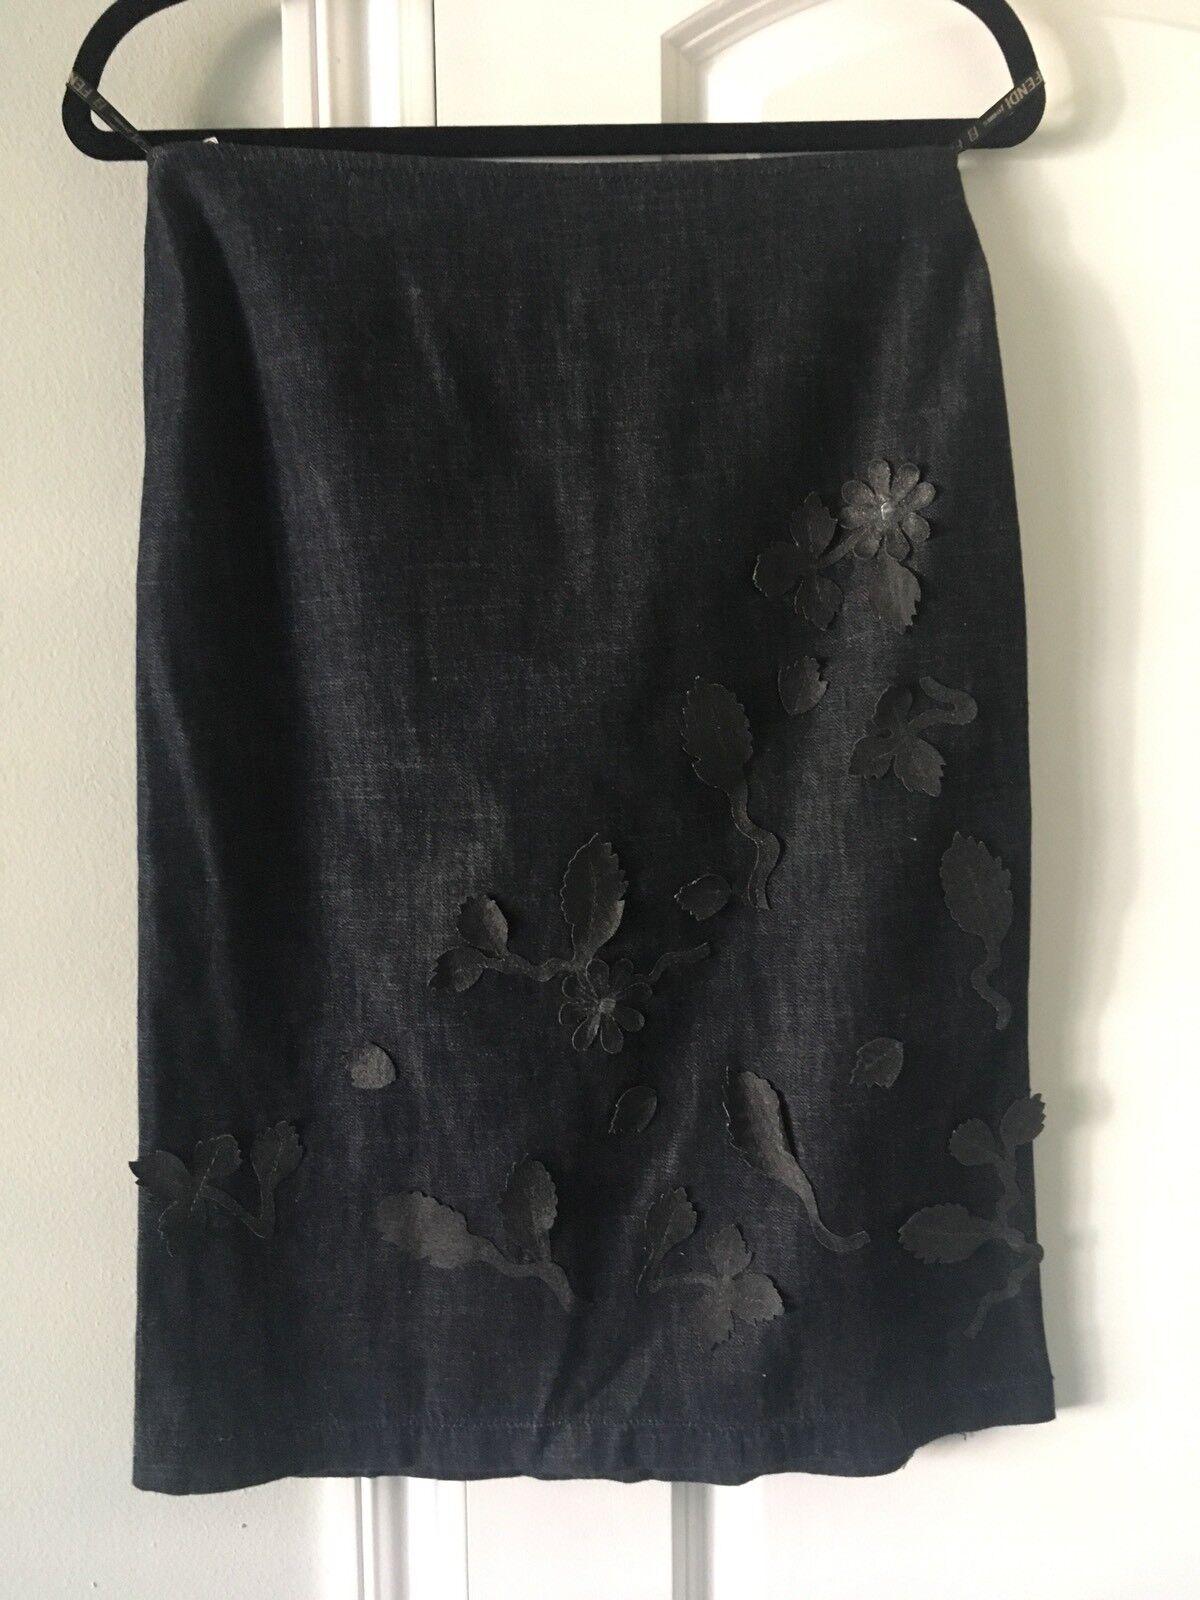 Fendi Floral Navy bluee Skirt Size 30